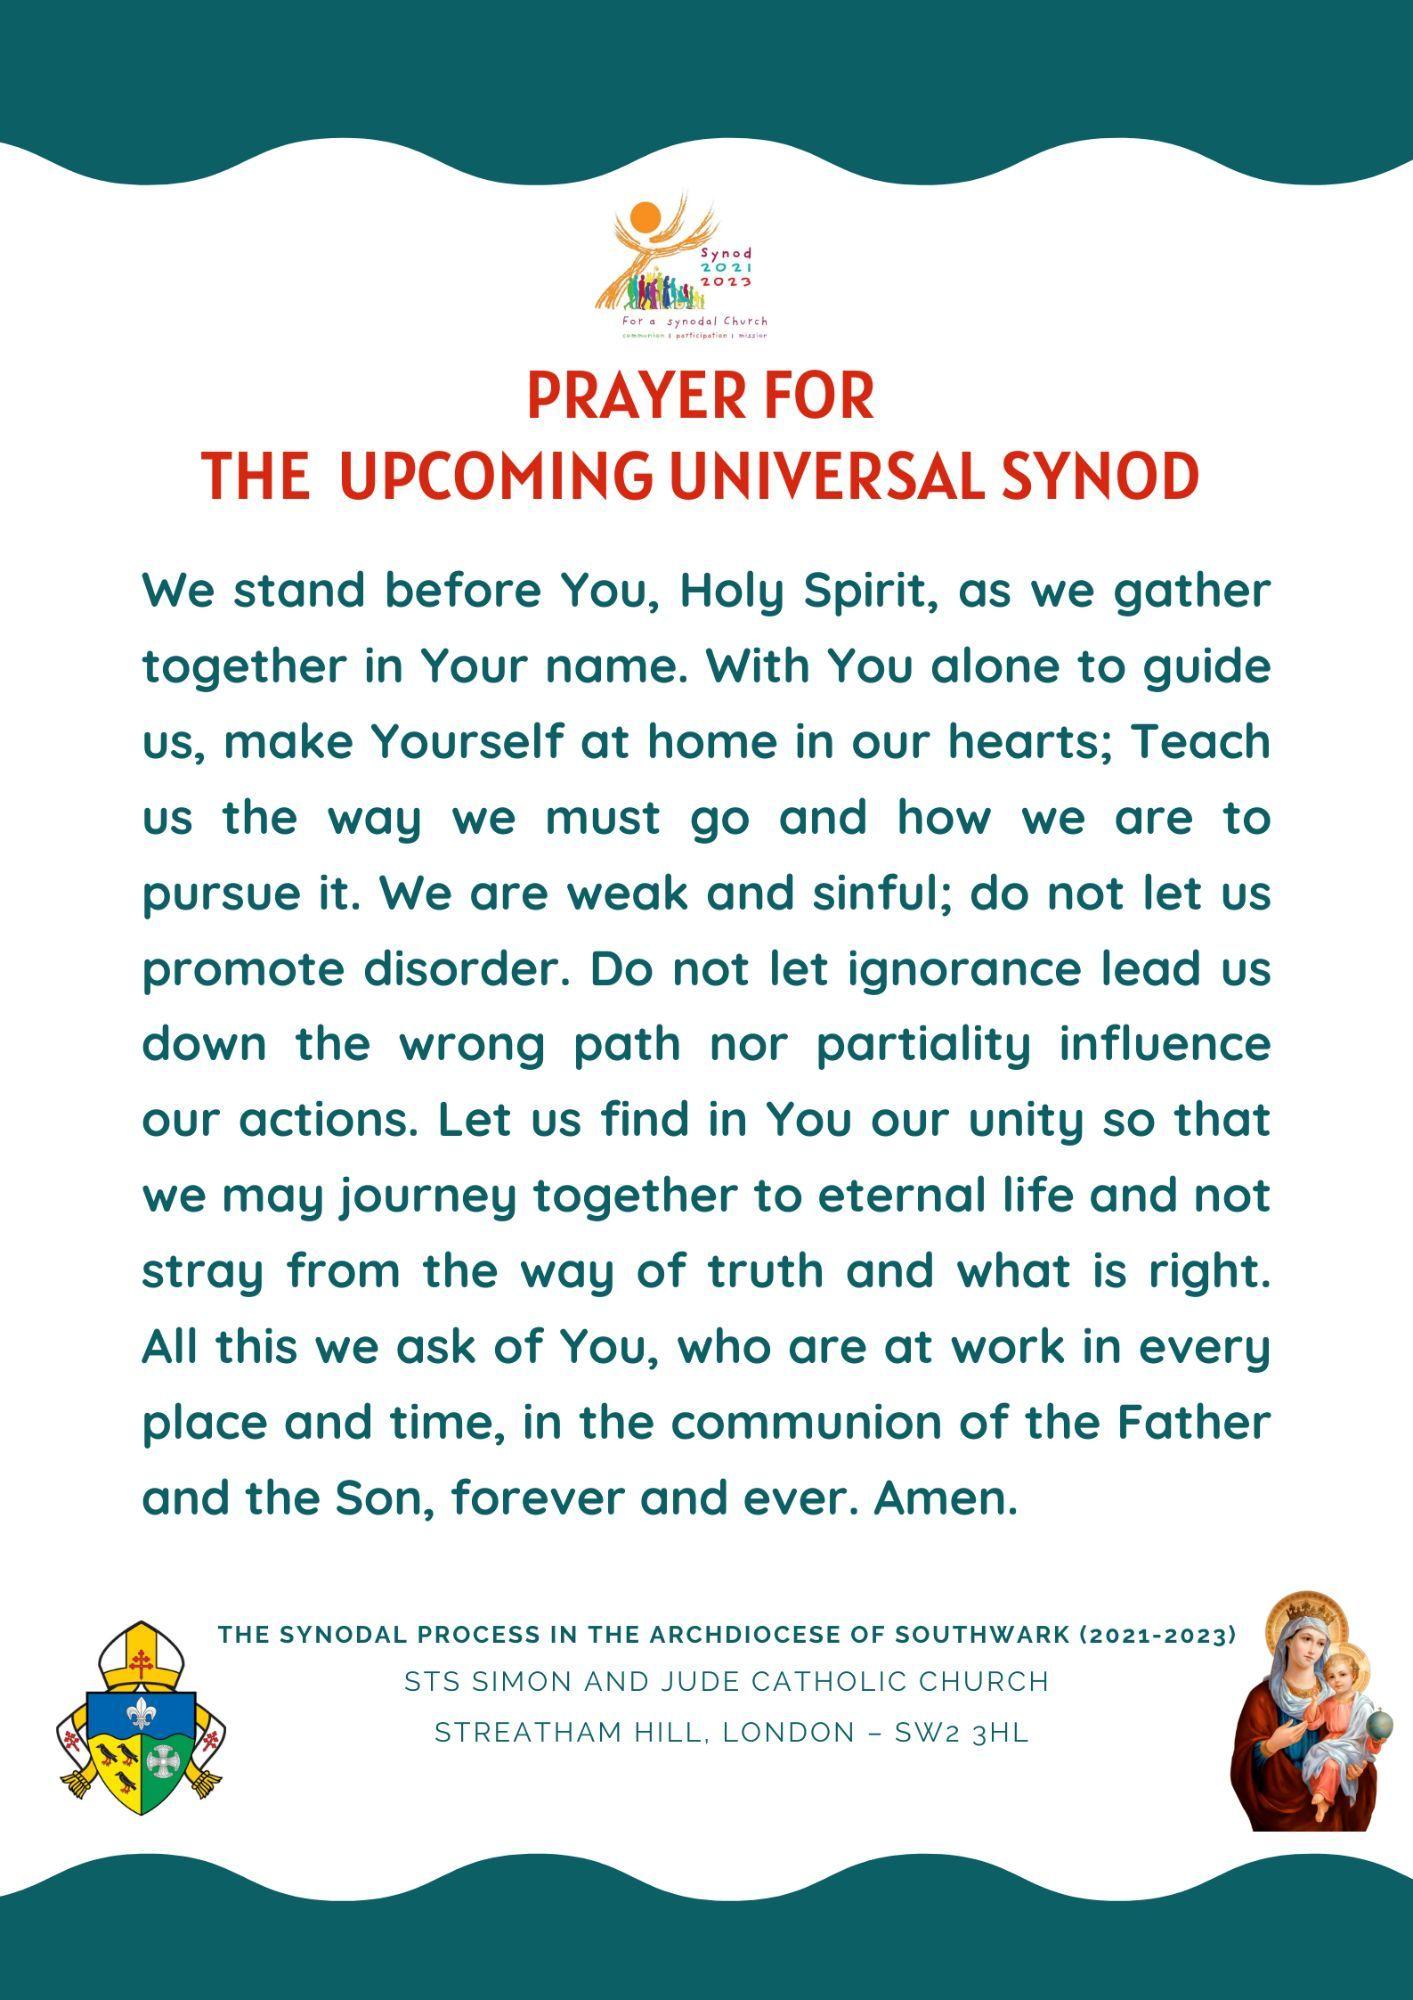 Prayer for the Upcoming Universal Synod  (Adsumus, Sancte Spiritus)